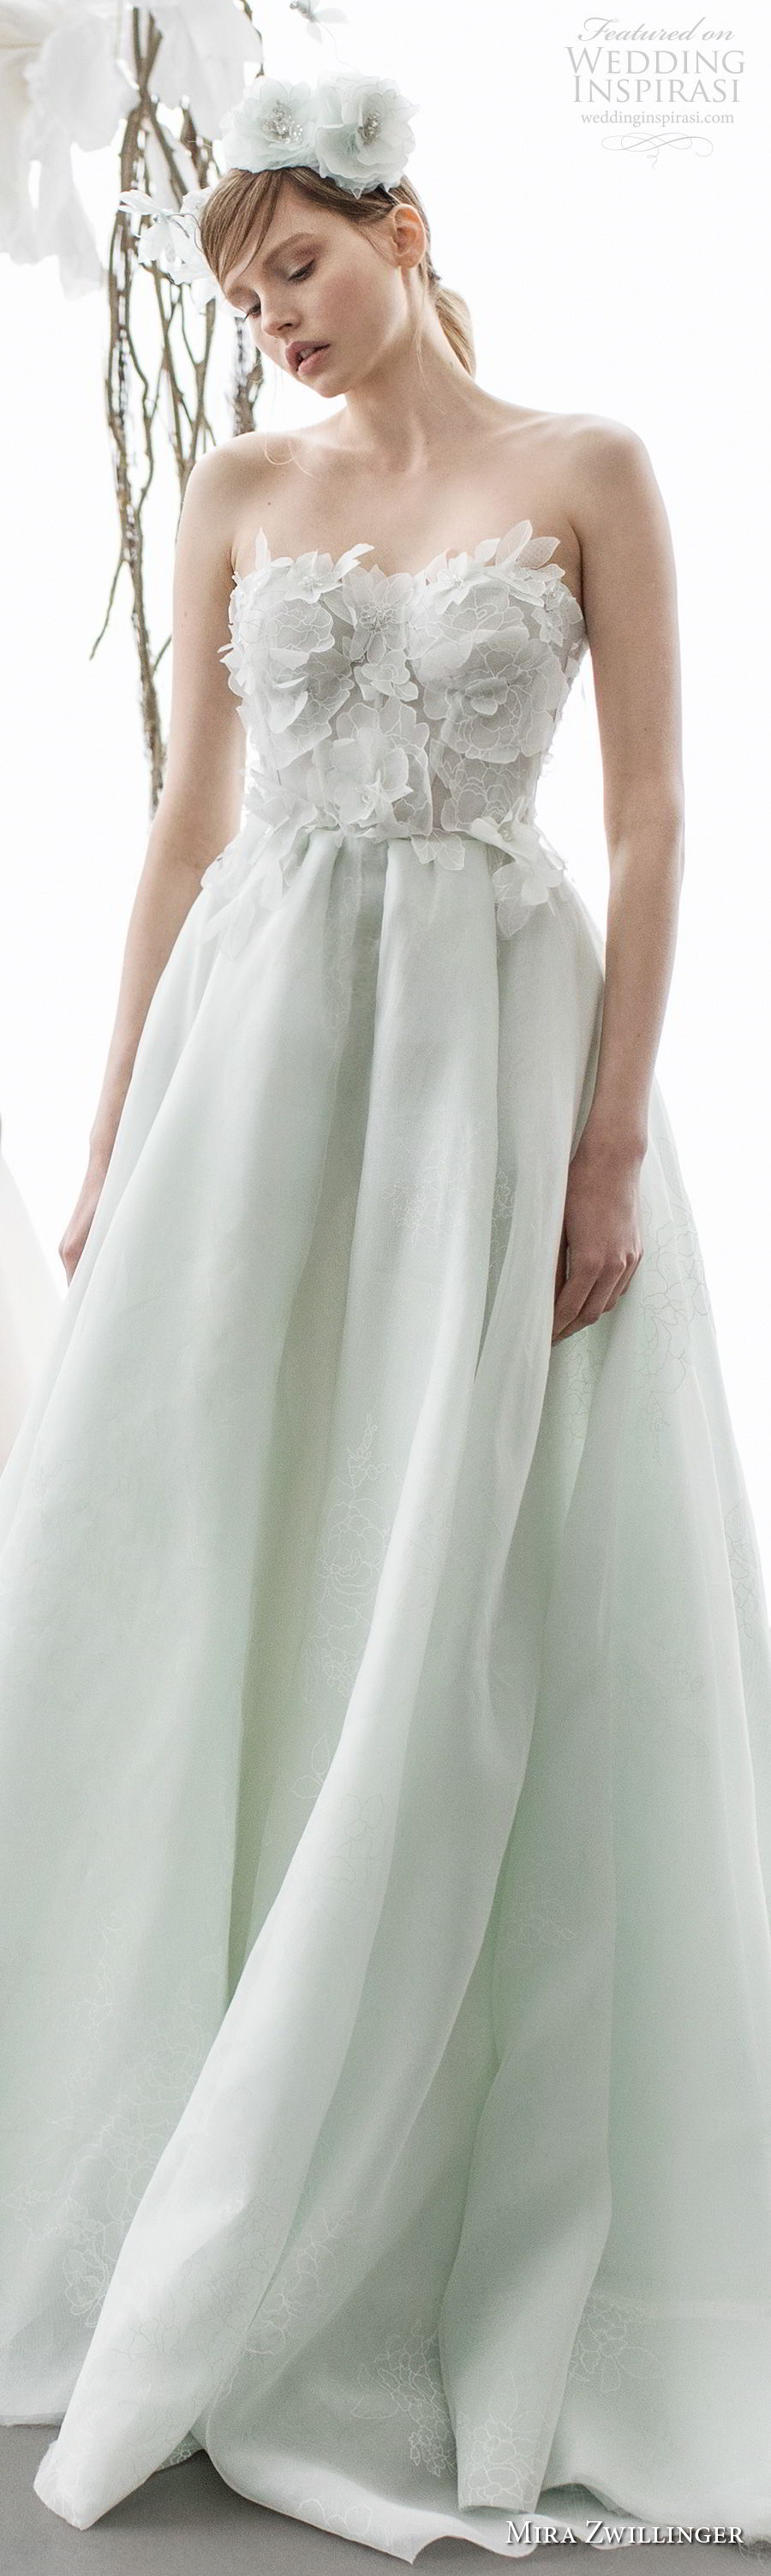 Strapless Sweetheart Neckline Heavily Embellished Bodice Green Color A Line Wedding Dress Chapel Train